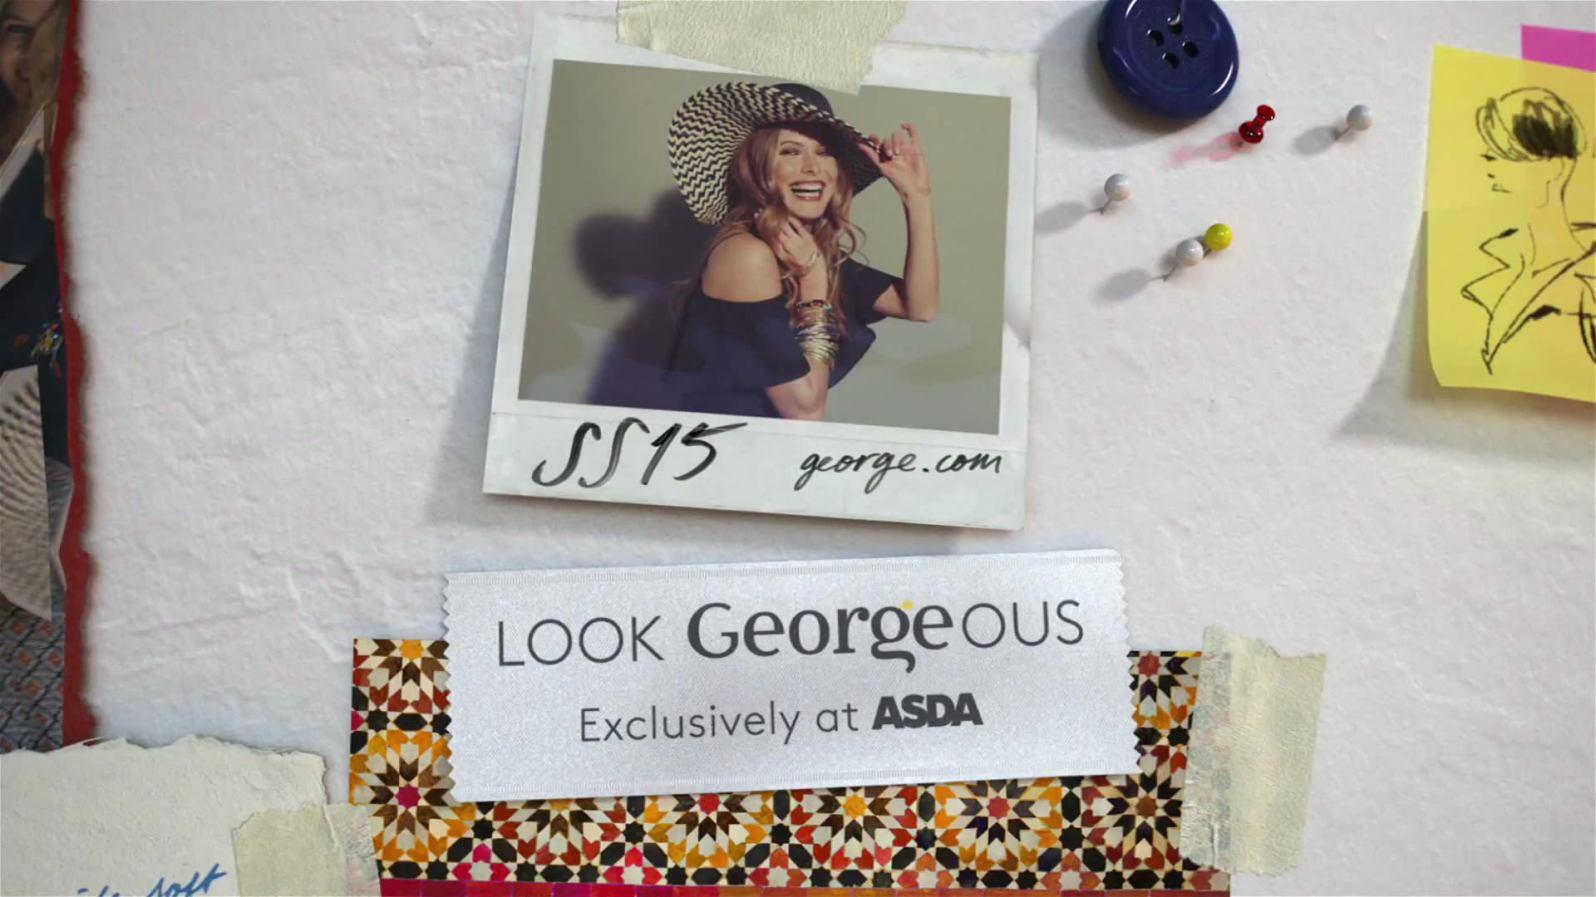 sc-george-at-asda-georgeous-spring-summer-2015-3